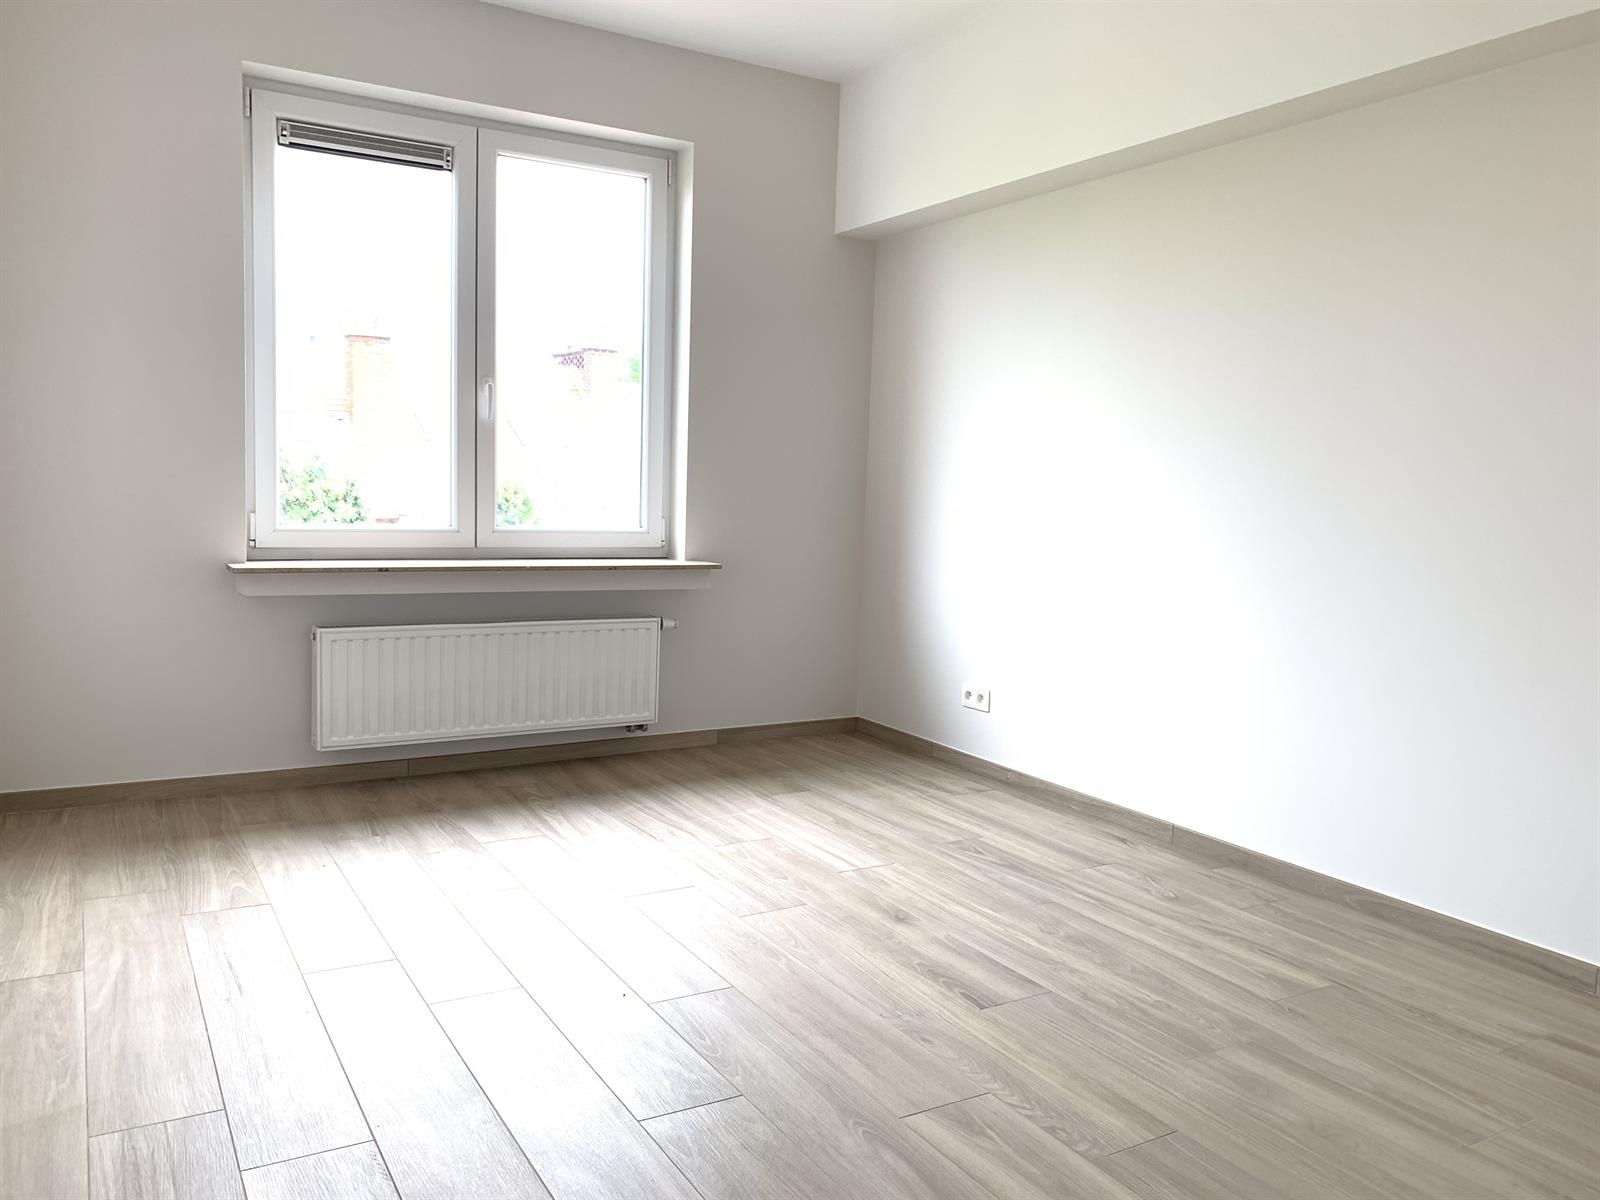 Appartement - Auderghem - #4393981-5